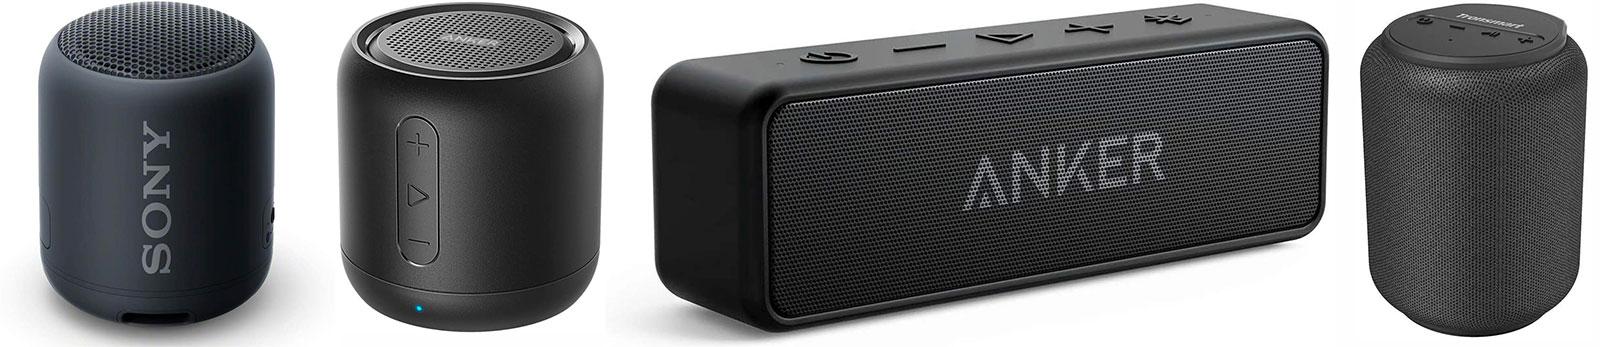 Altavoces Bluetooth externos